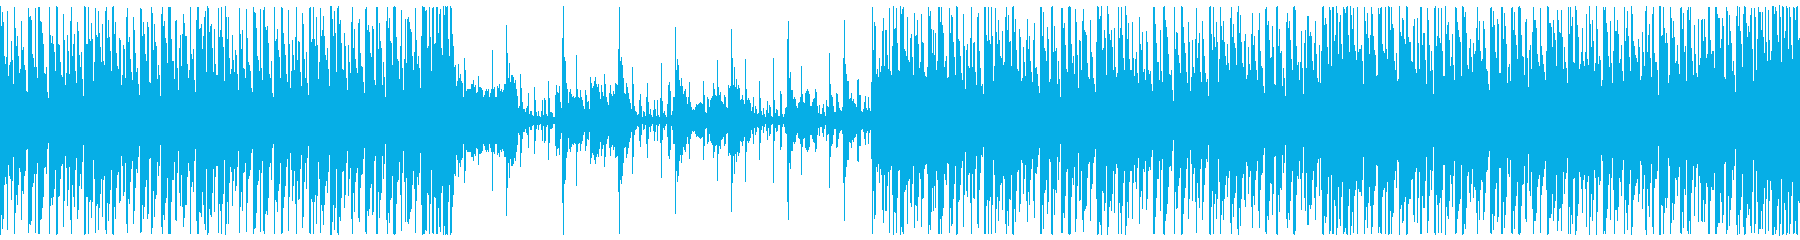 CM用7、アフリカン打楽器+声、賑やかBの再生済みの波形